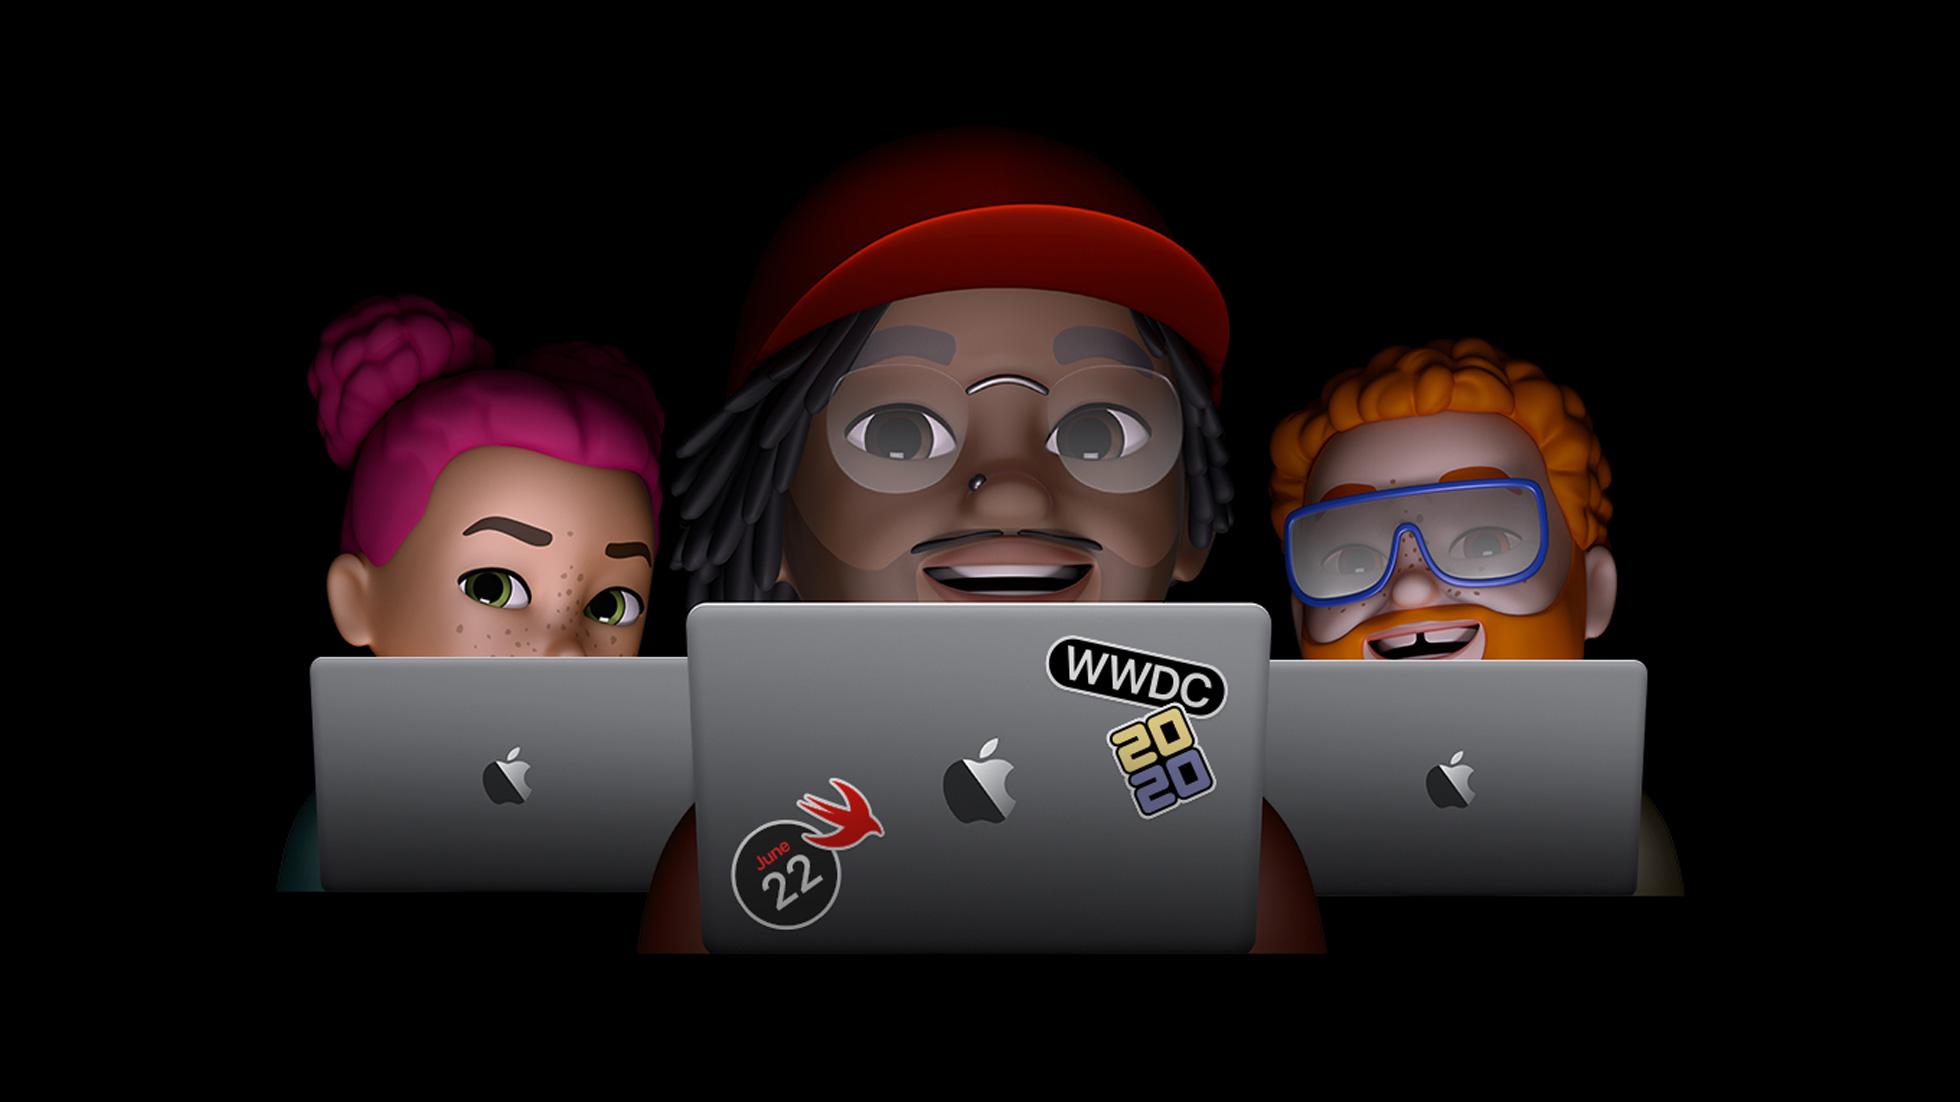 Apple ได้ประกาศวันจัดงาน WWDC20 หรือ Worldwide Developers Conference ของปี 2020 นี้ เริ่มต้นวันที่ 22 มิถุนายนในแอพ Apple Developerและบนเว็บไซต์ Apple Developer ฟรีสำหรับนักพัฒนาทุกคน